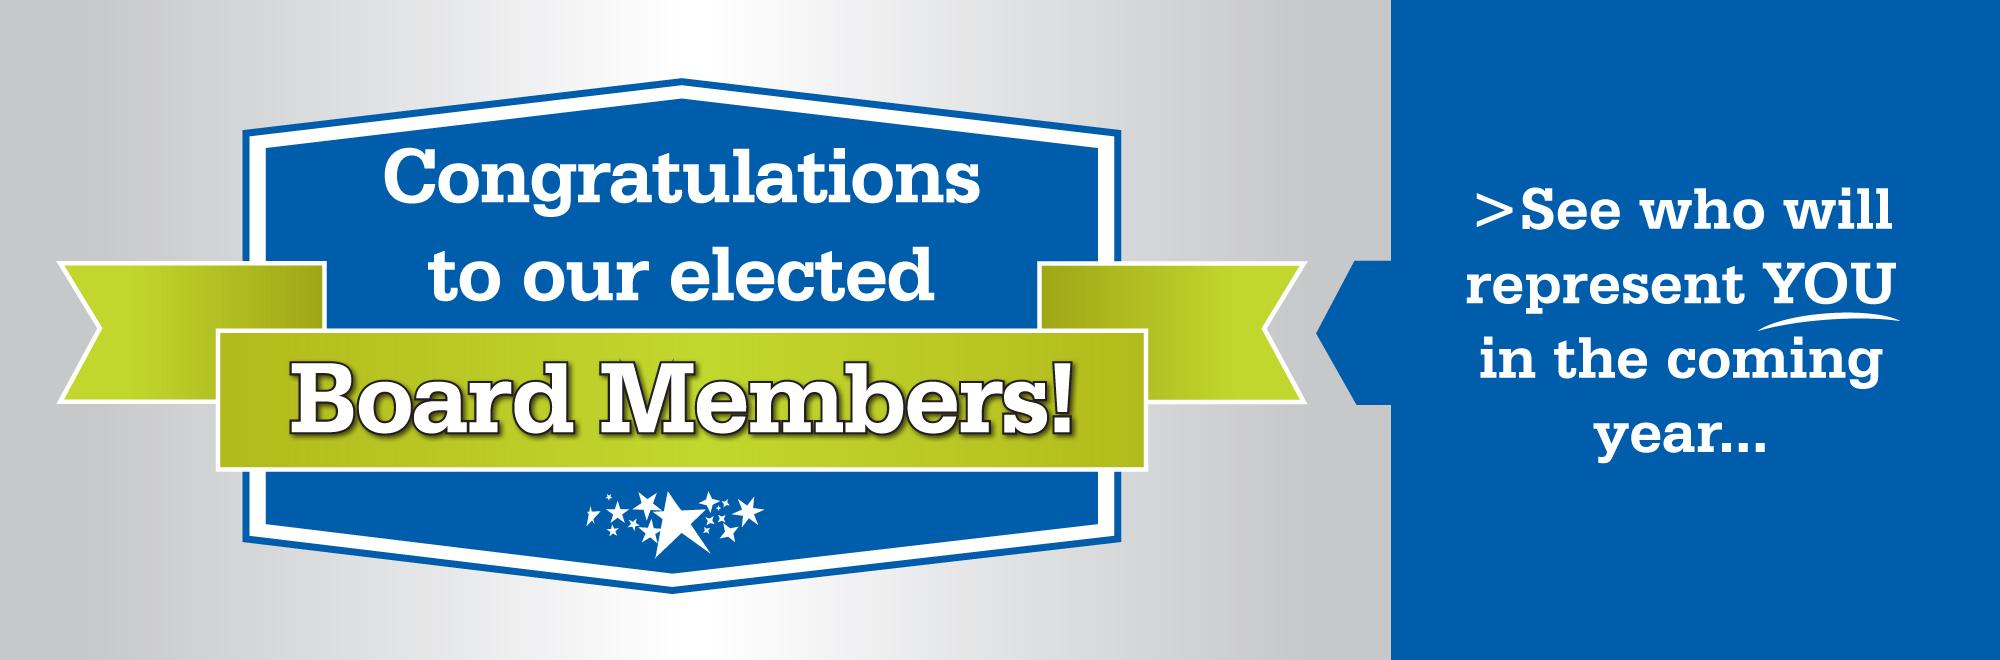 Congratulations Board Members!